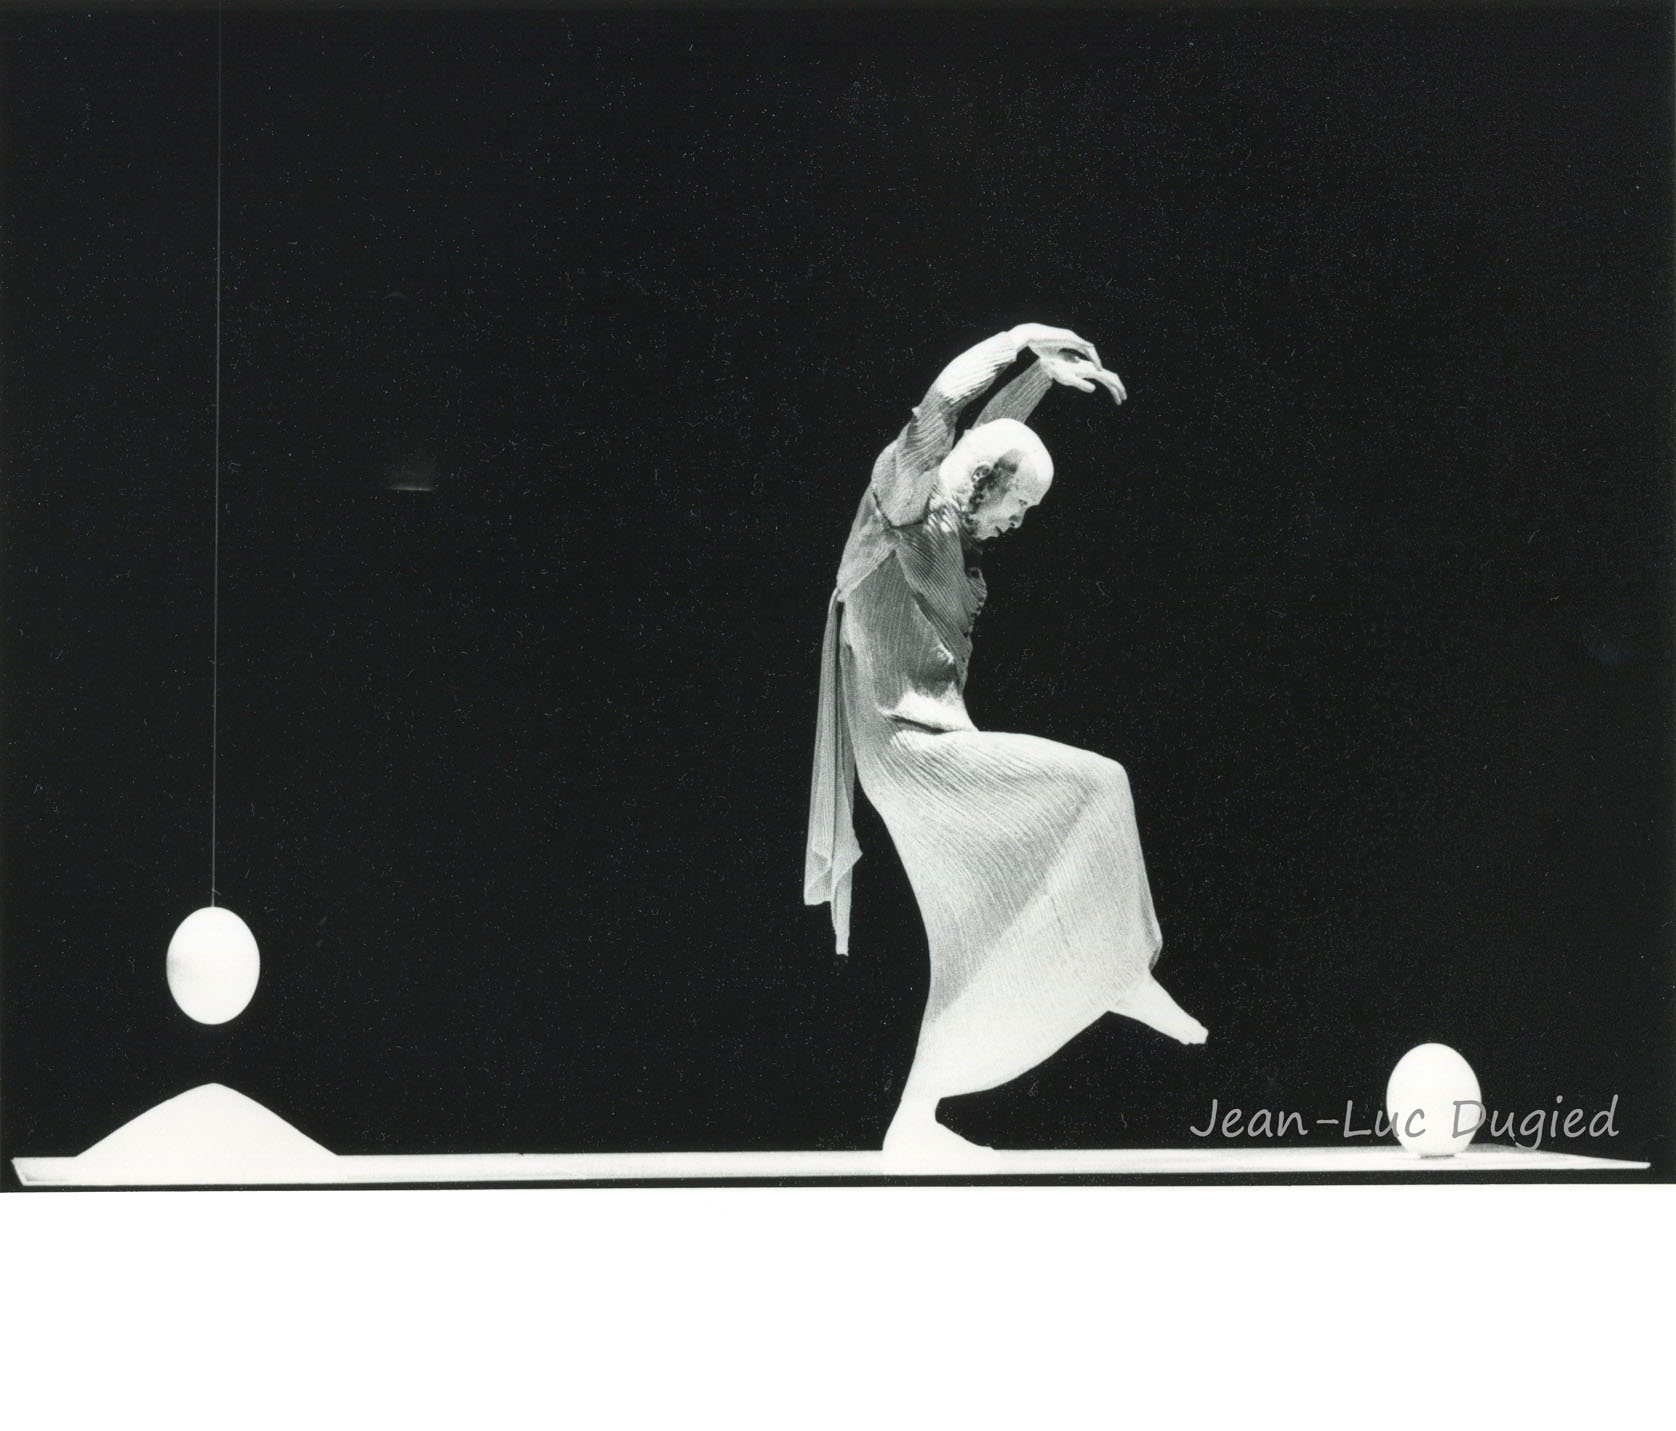 29 Sankai Juku - Unetsu (des oeufs debout par curiosité) - chor. Ushio Amagatsu - 1986